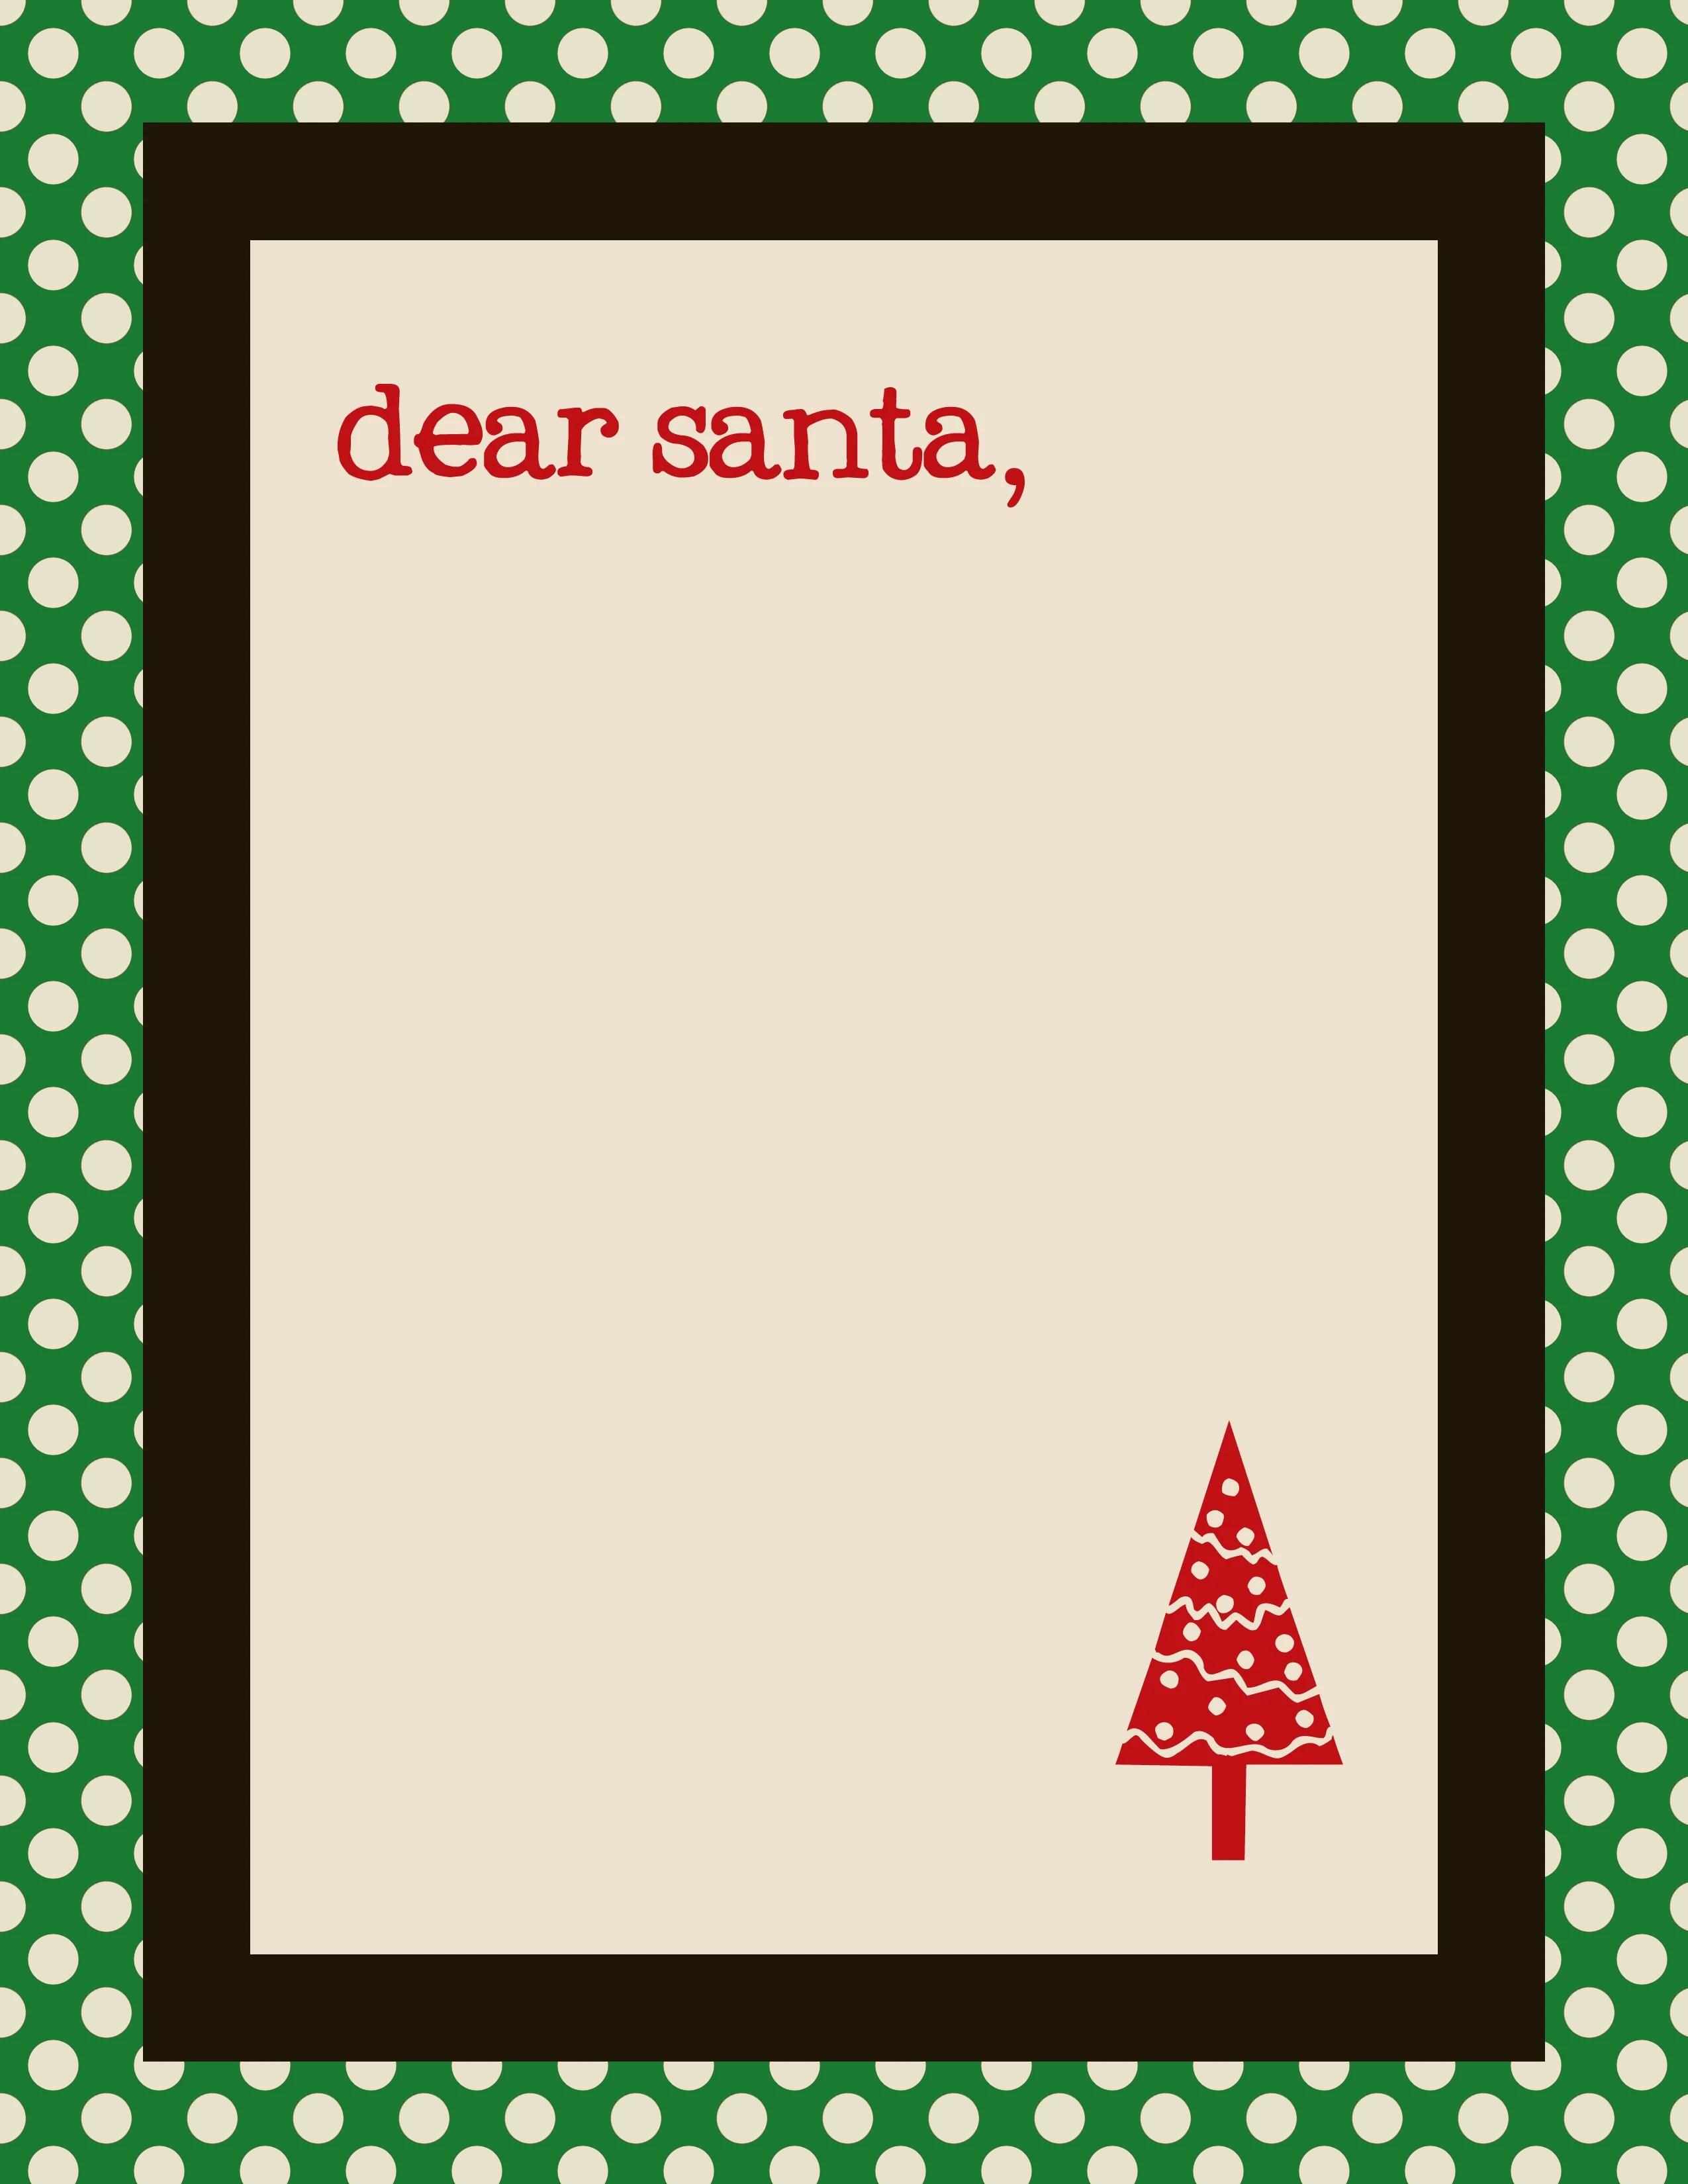 Free Santa Letter Templates